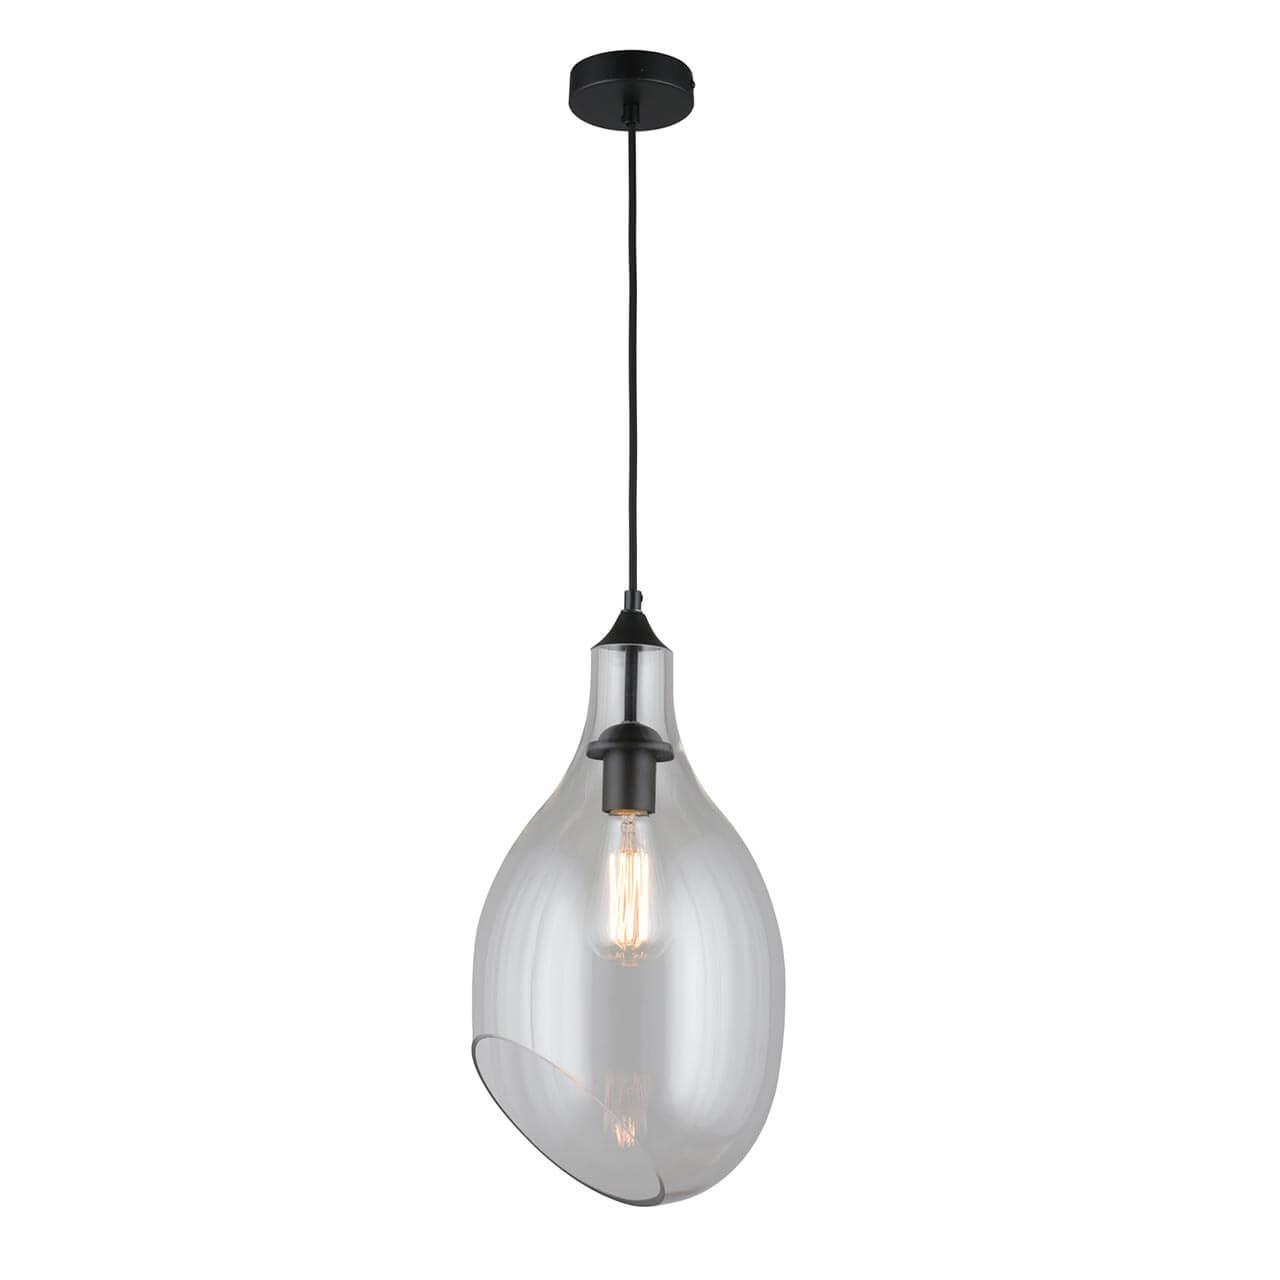 Подвесной светильник Omnilux OML-93006-01, E27, 60 Вт